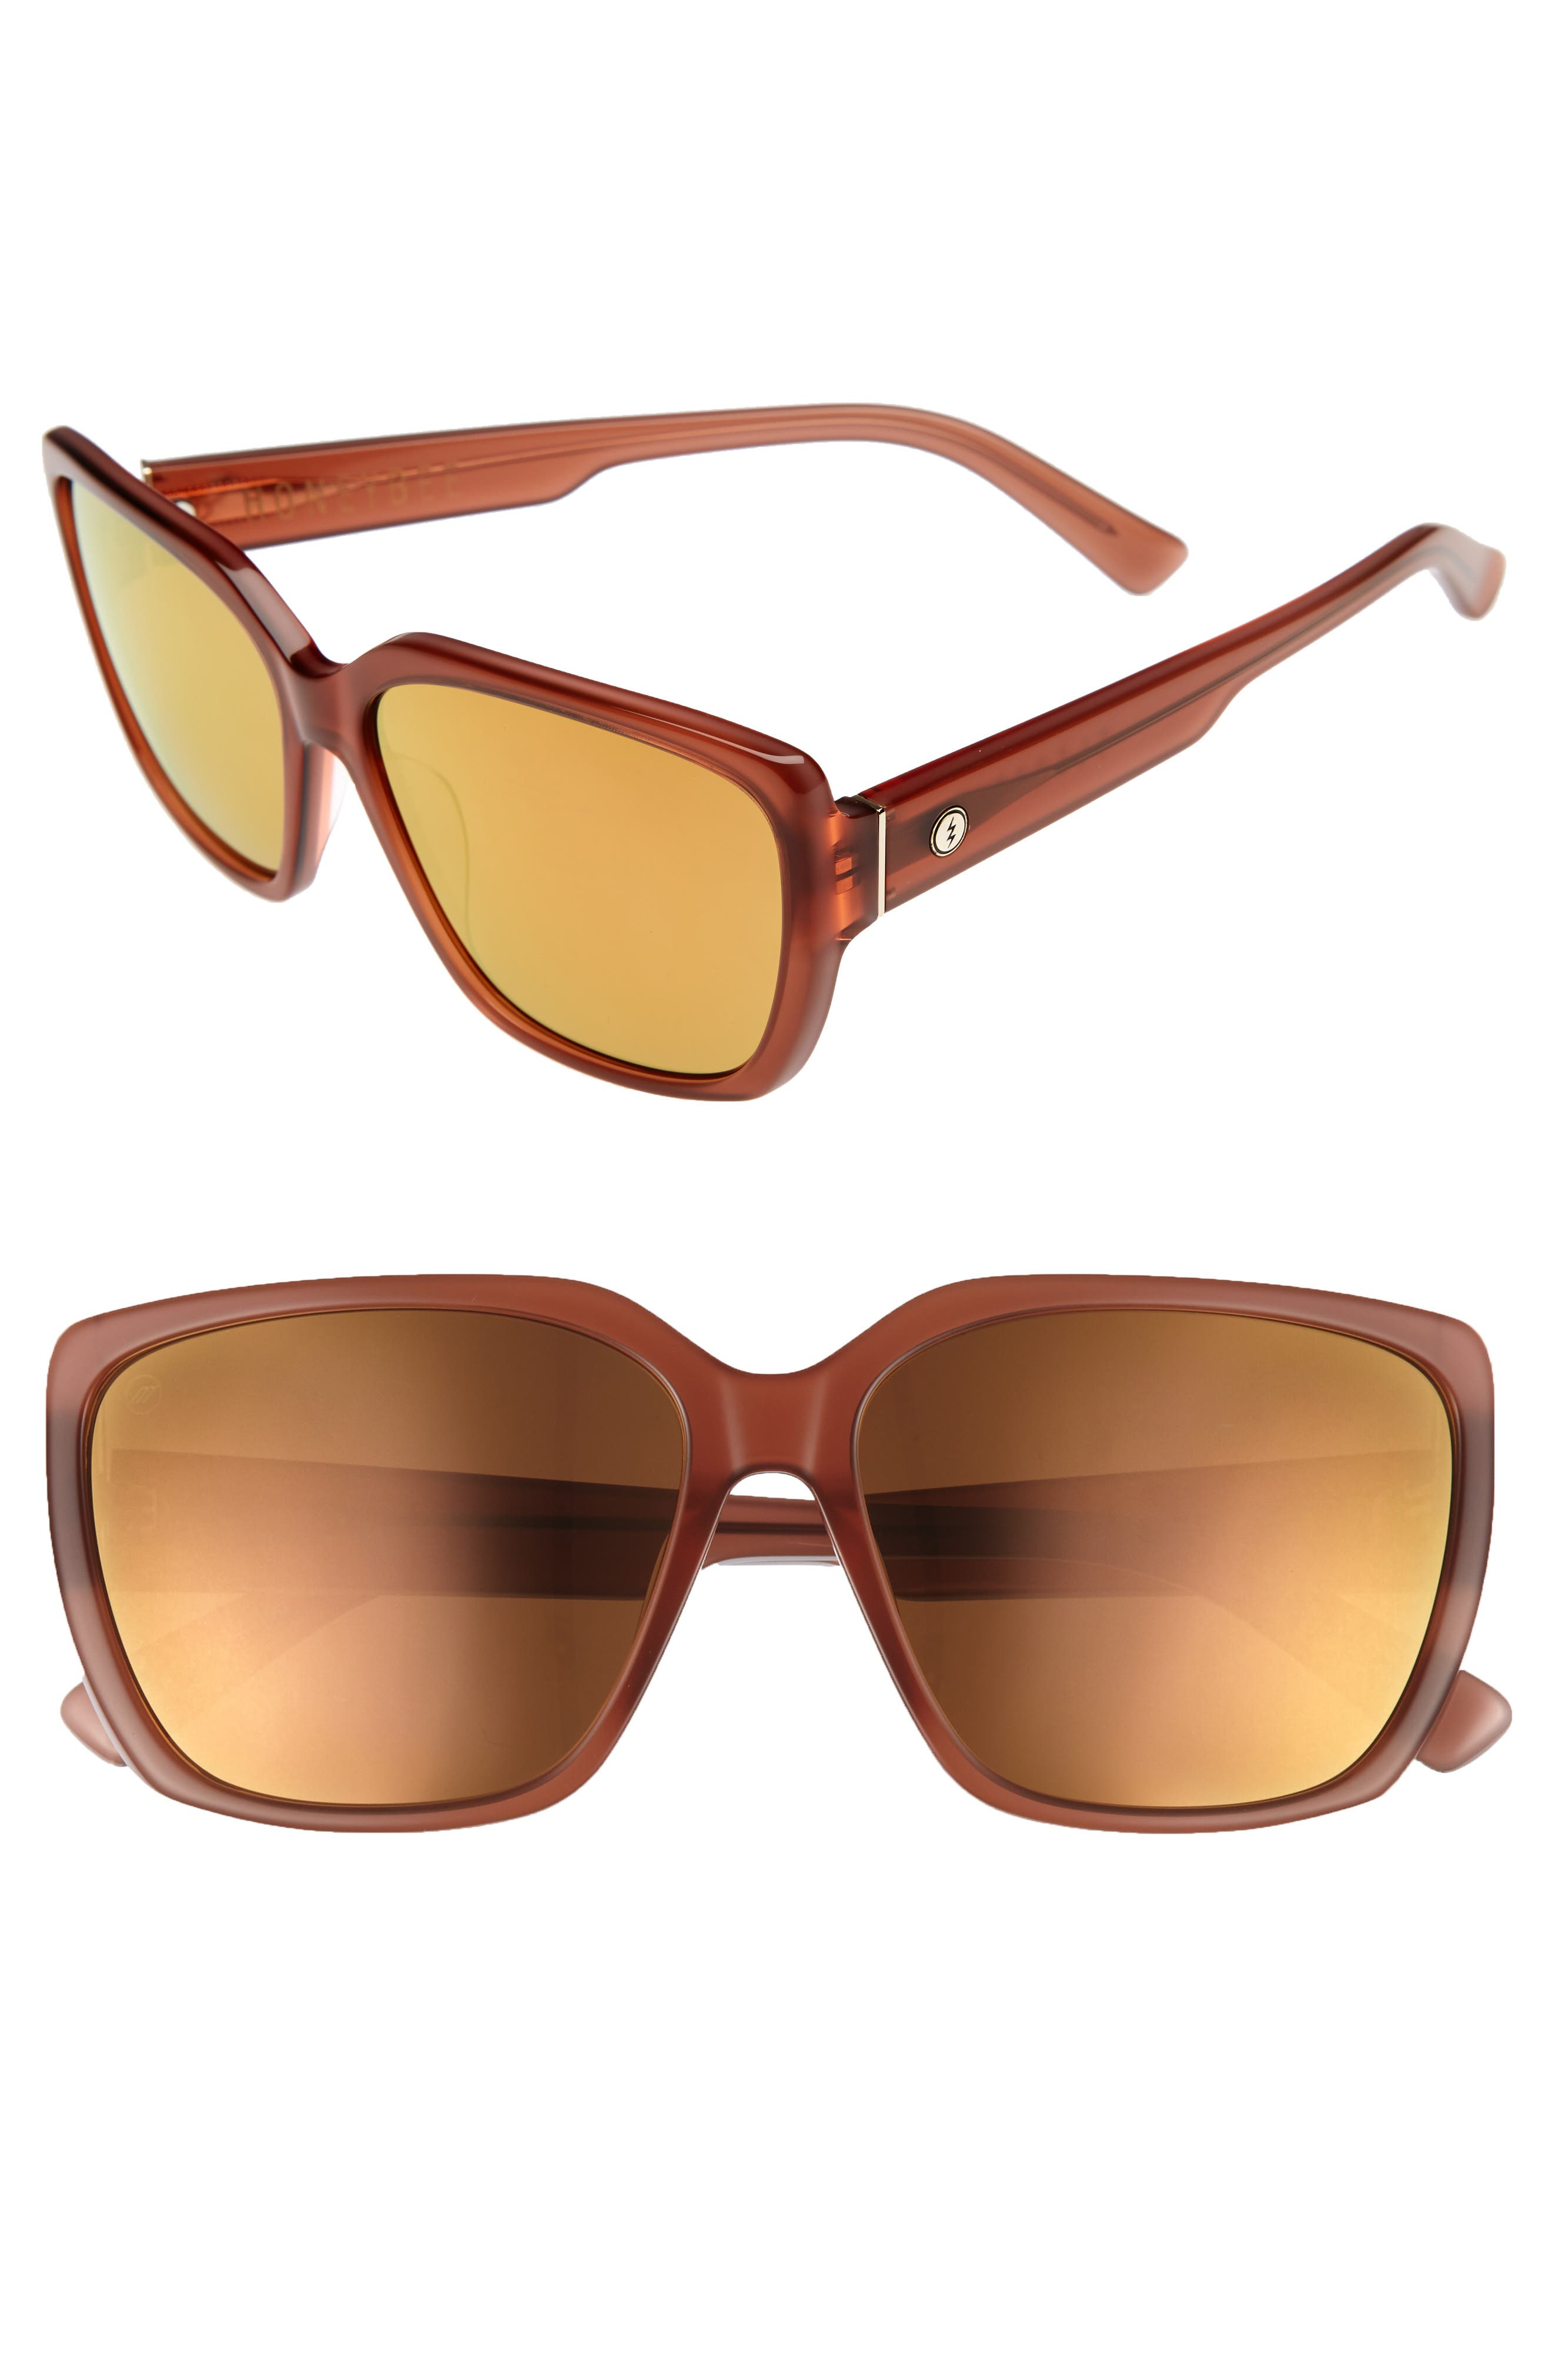 Honey Bee 60mm Mirrored Sunglasses,                         Main,                         color, CALAFIA ROSE/ CHAMPAGNE